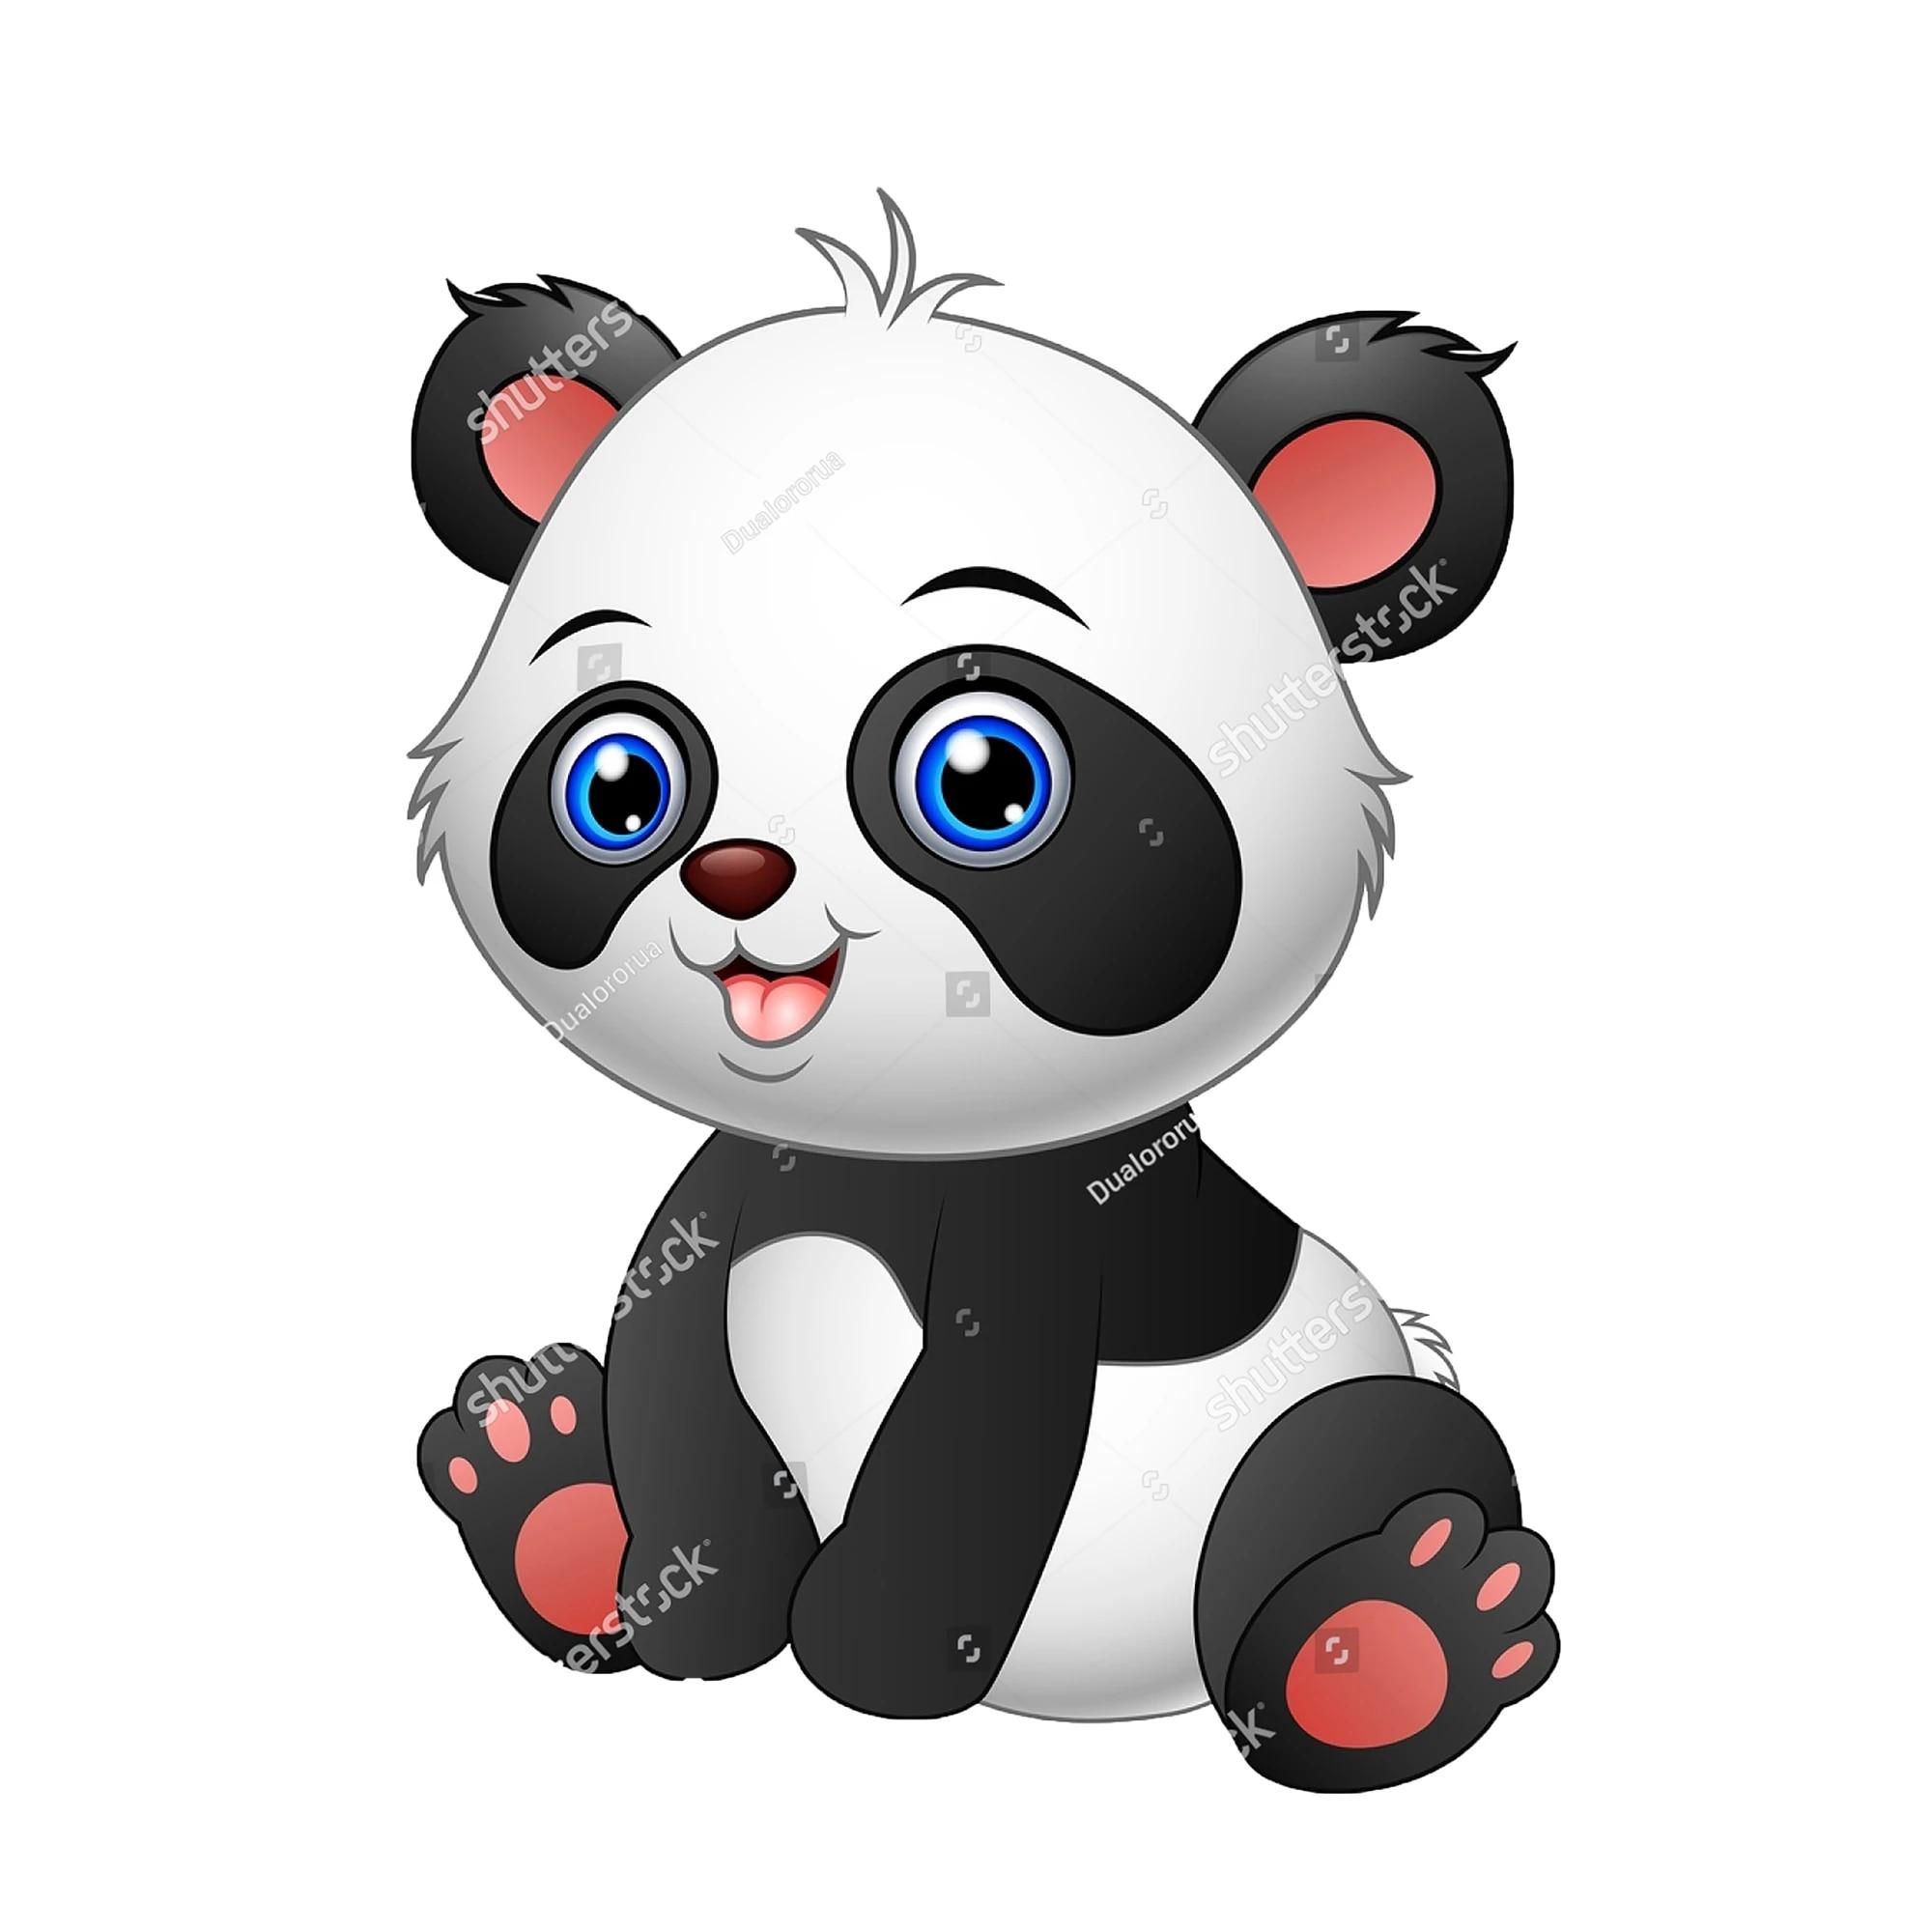 Panda Playing The Flute Tee Women/'s Image by Shutterstock